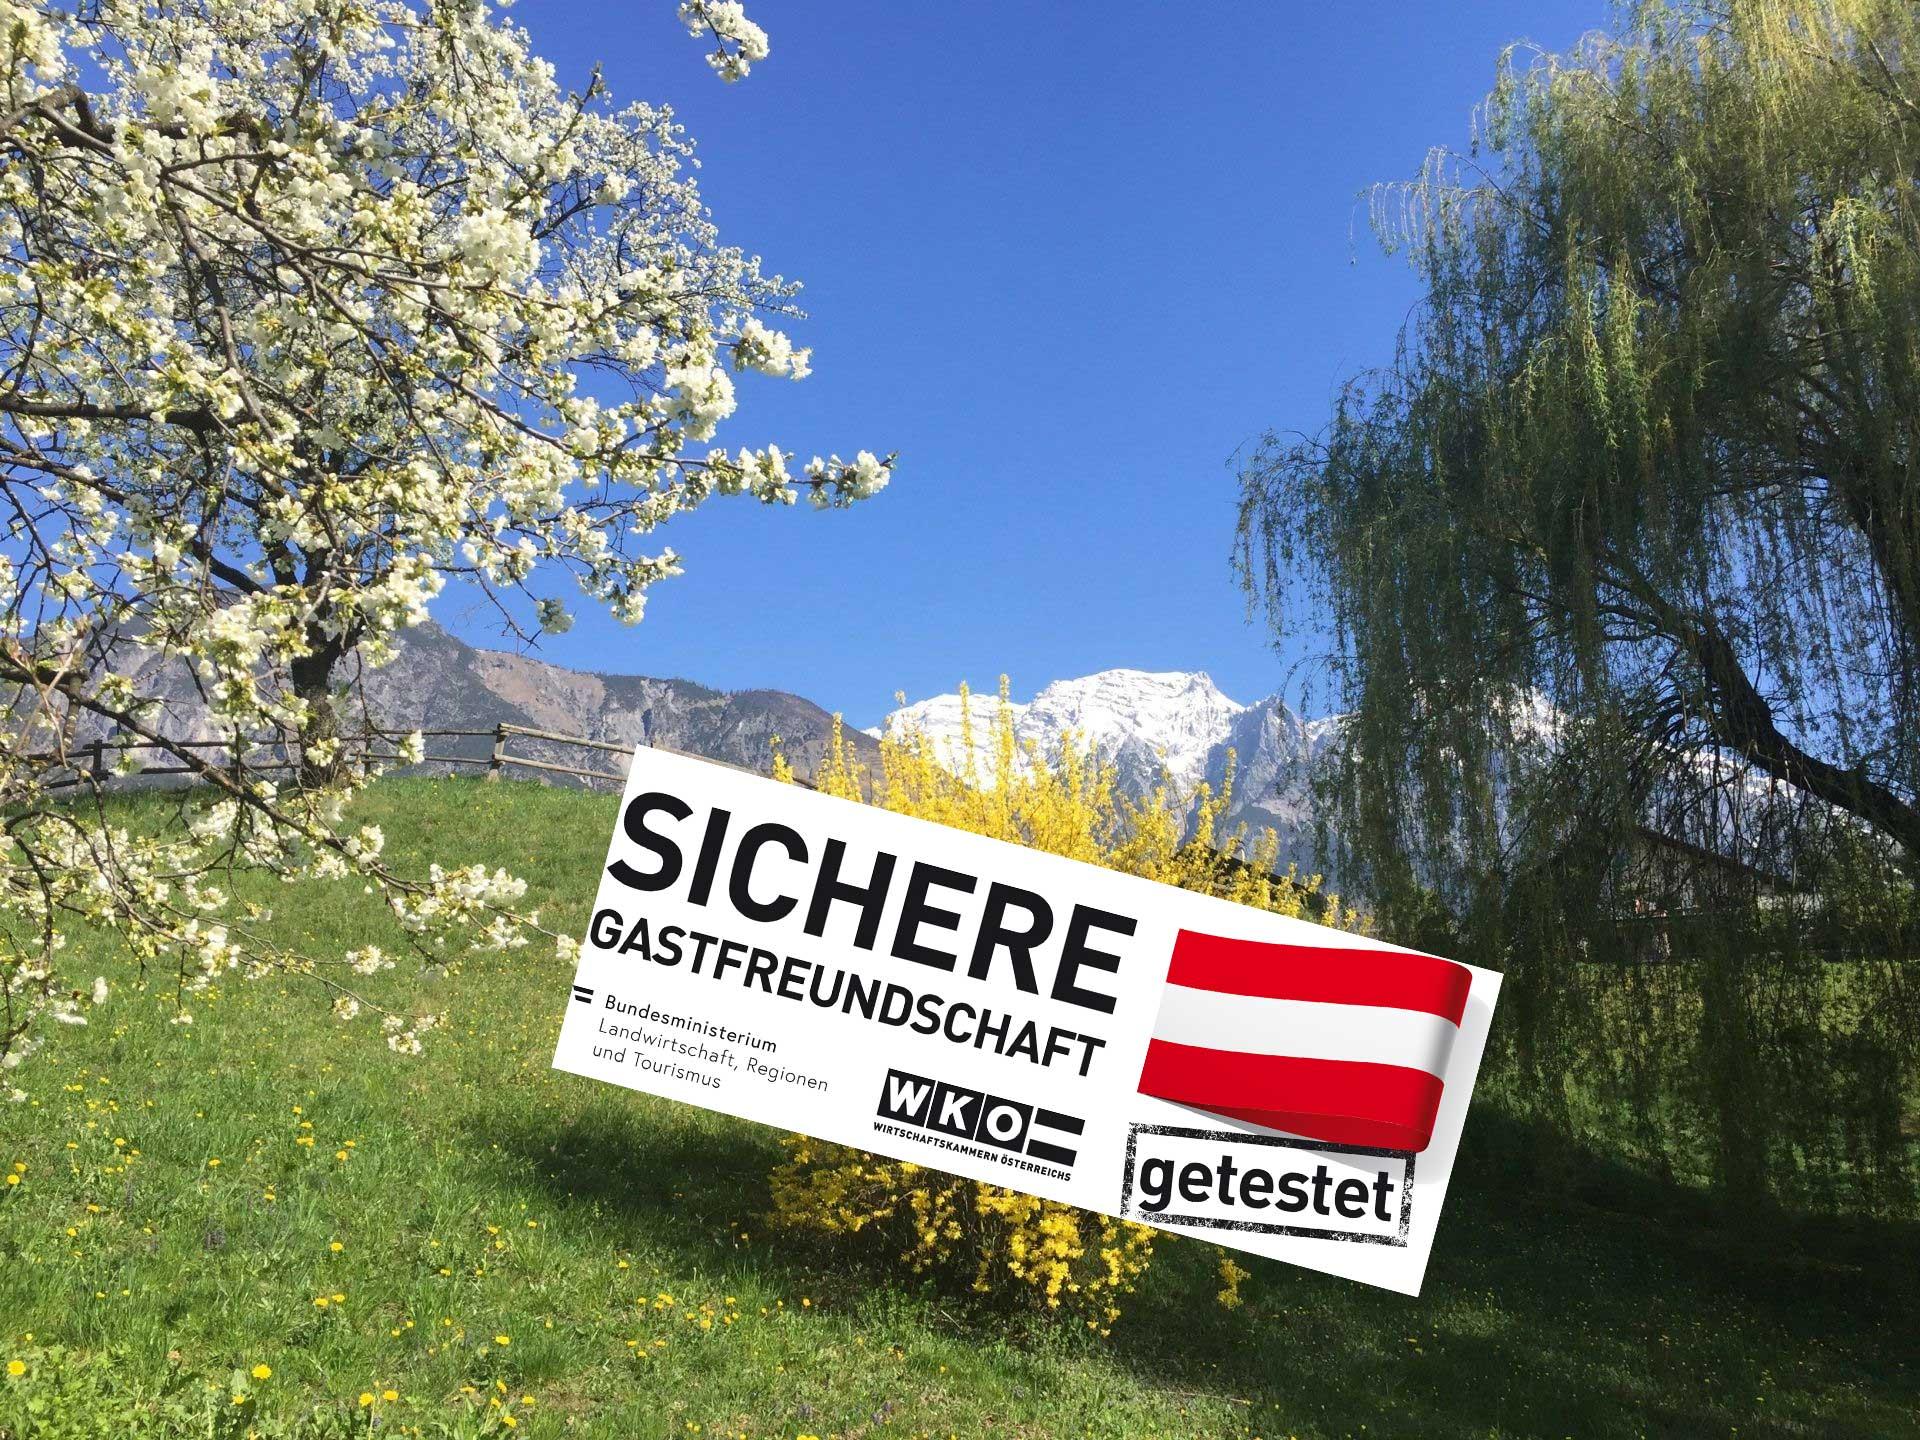 covid-getestet Hotel Heiligkreuz Hall in Tirol bei Innsbruck